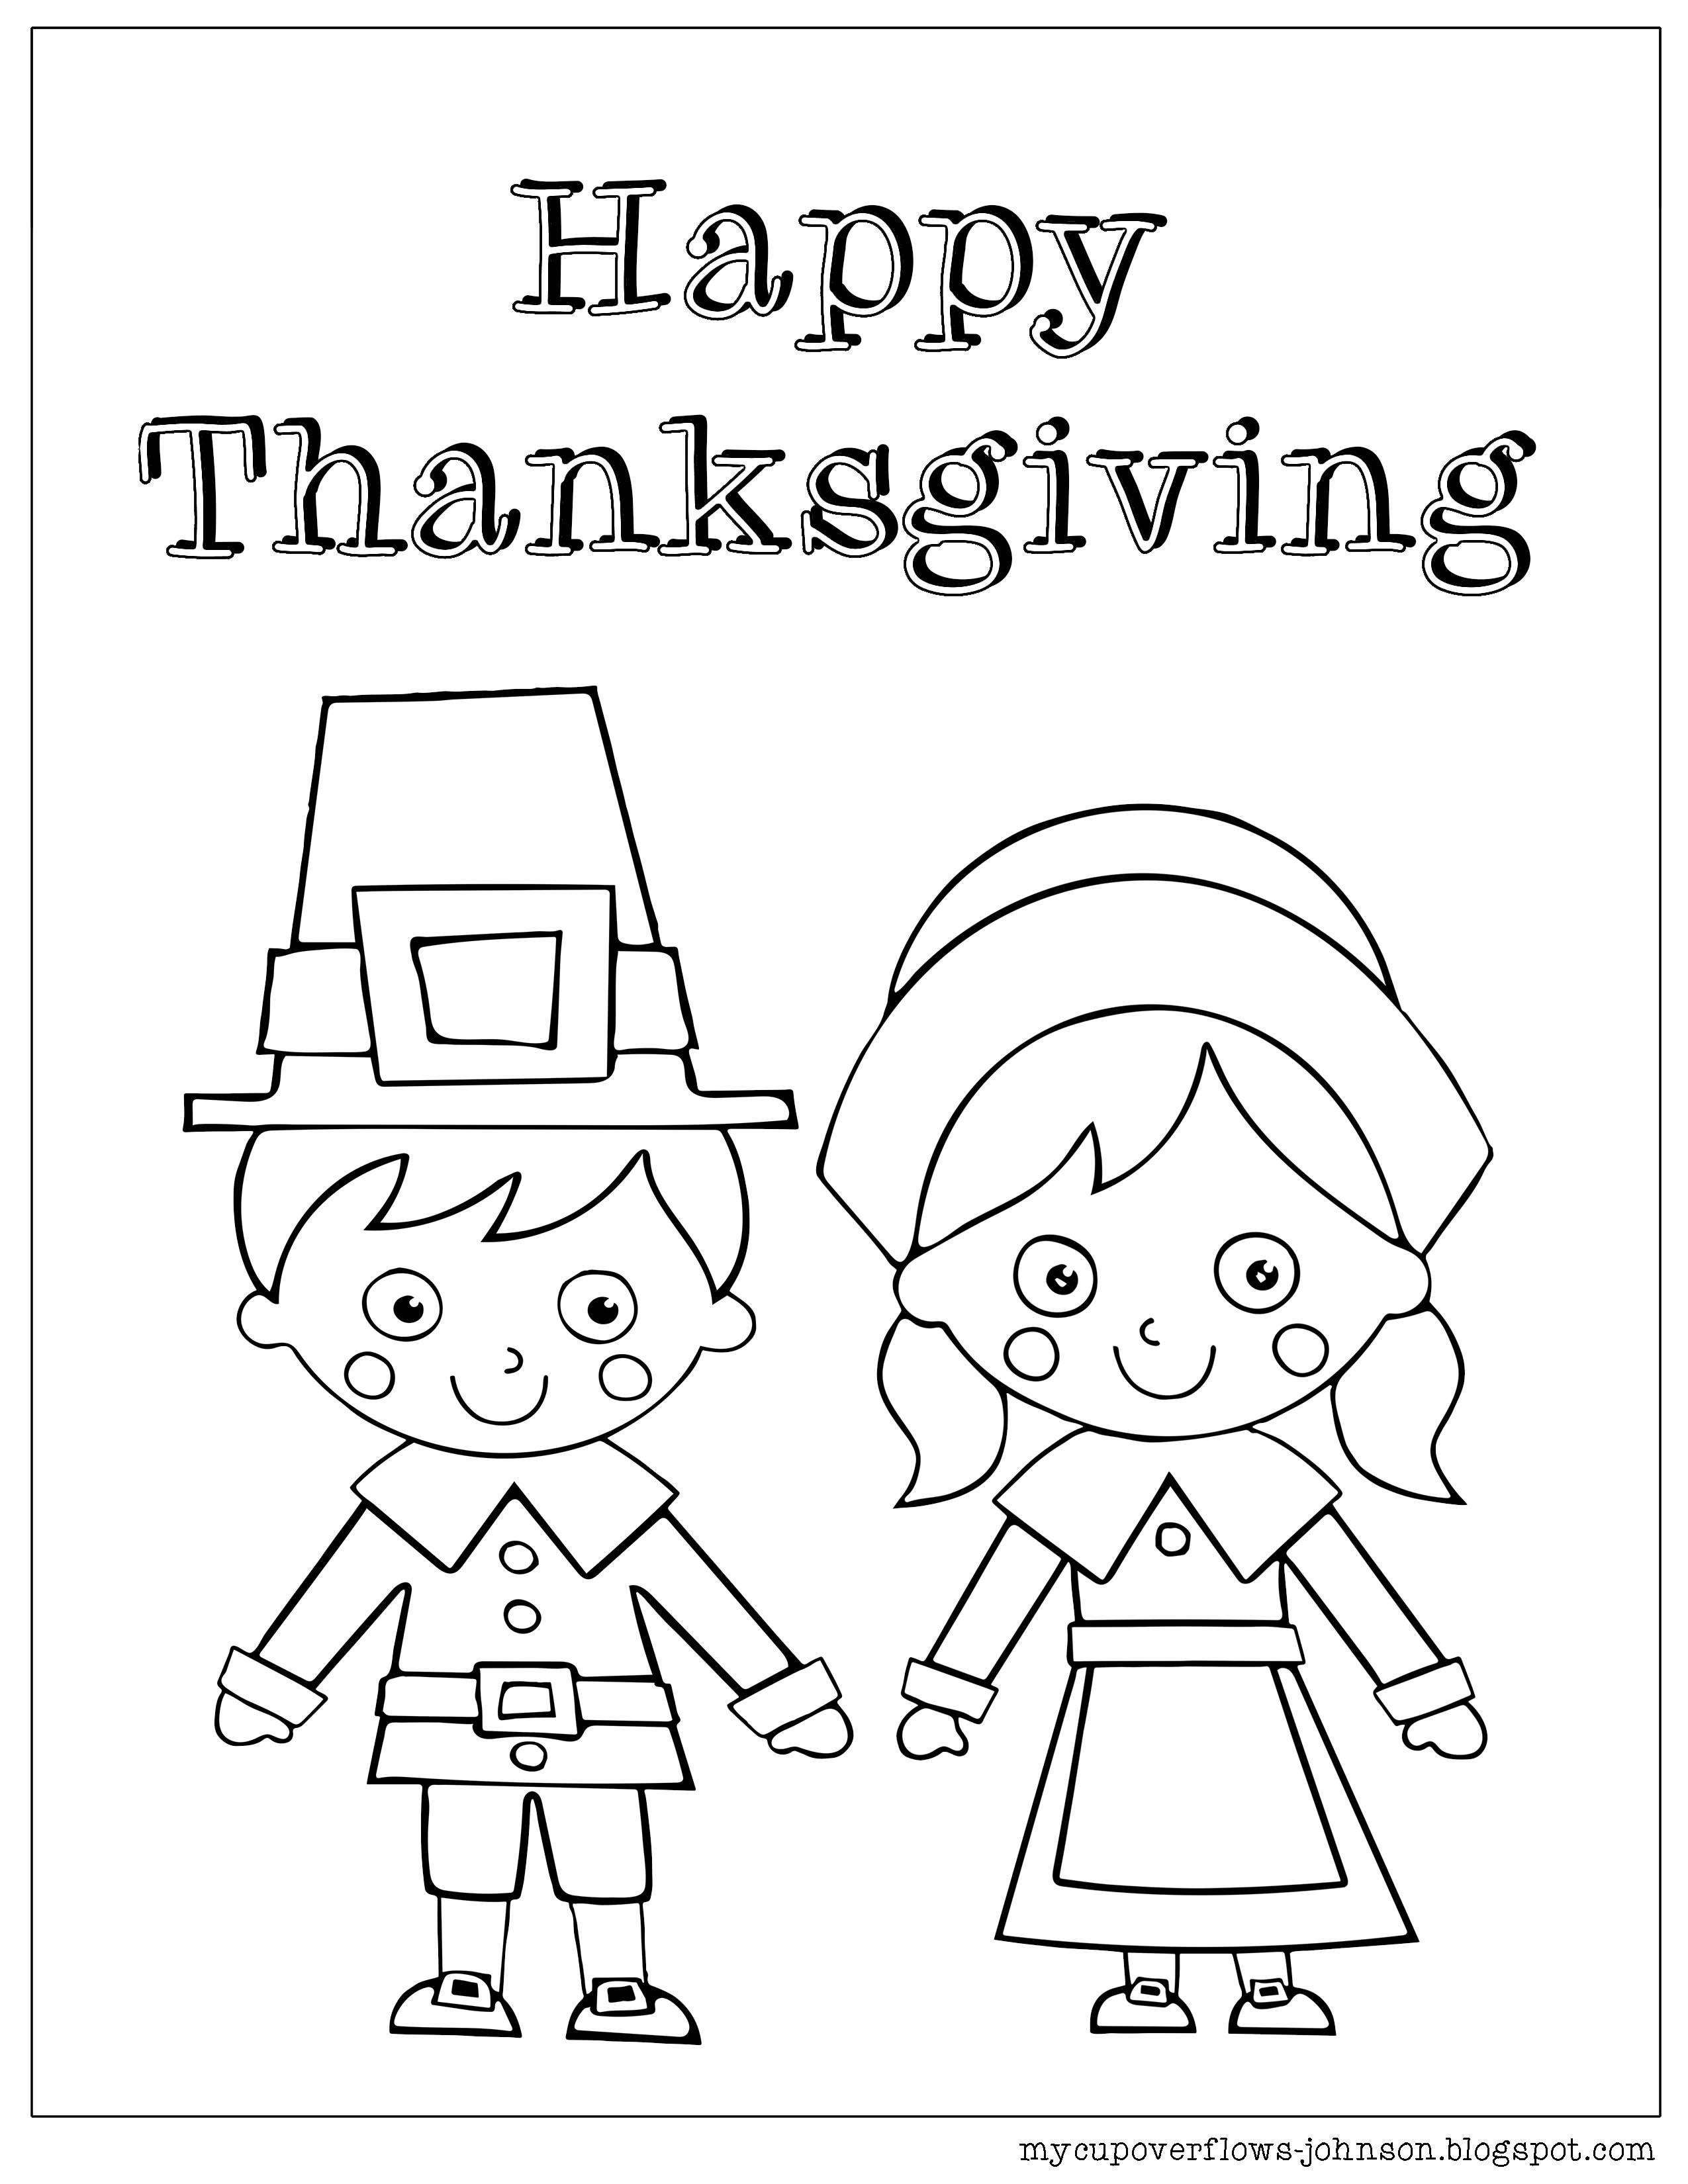 Pilgrim Coloring Pages For Preschool